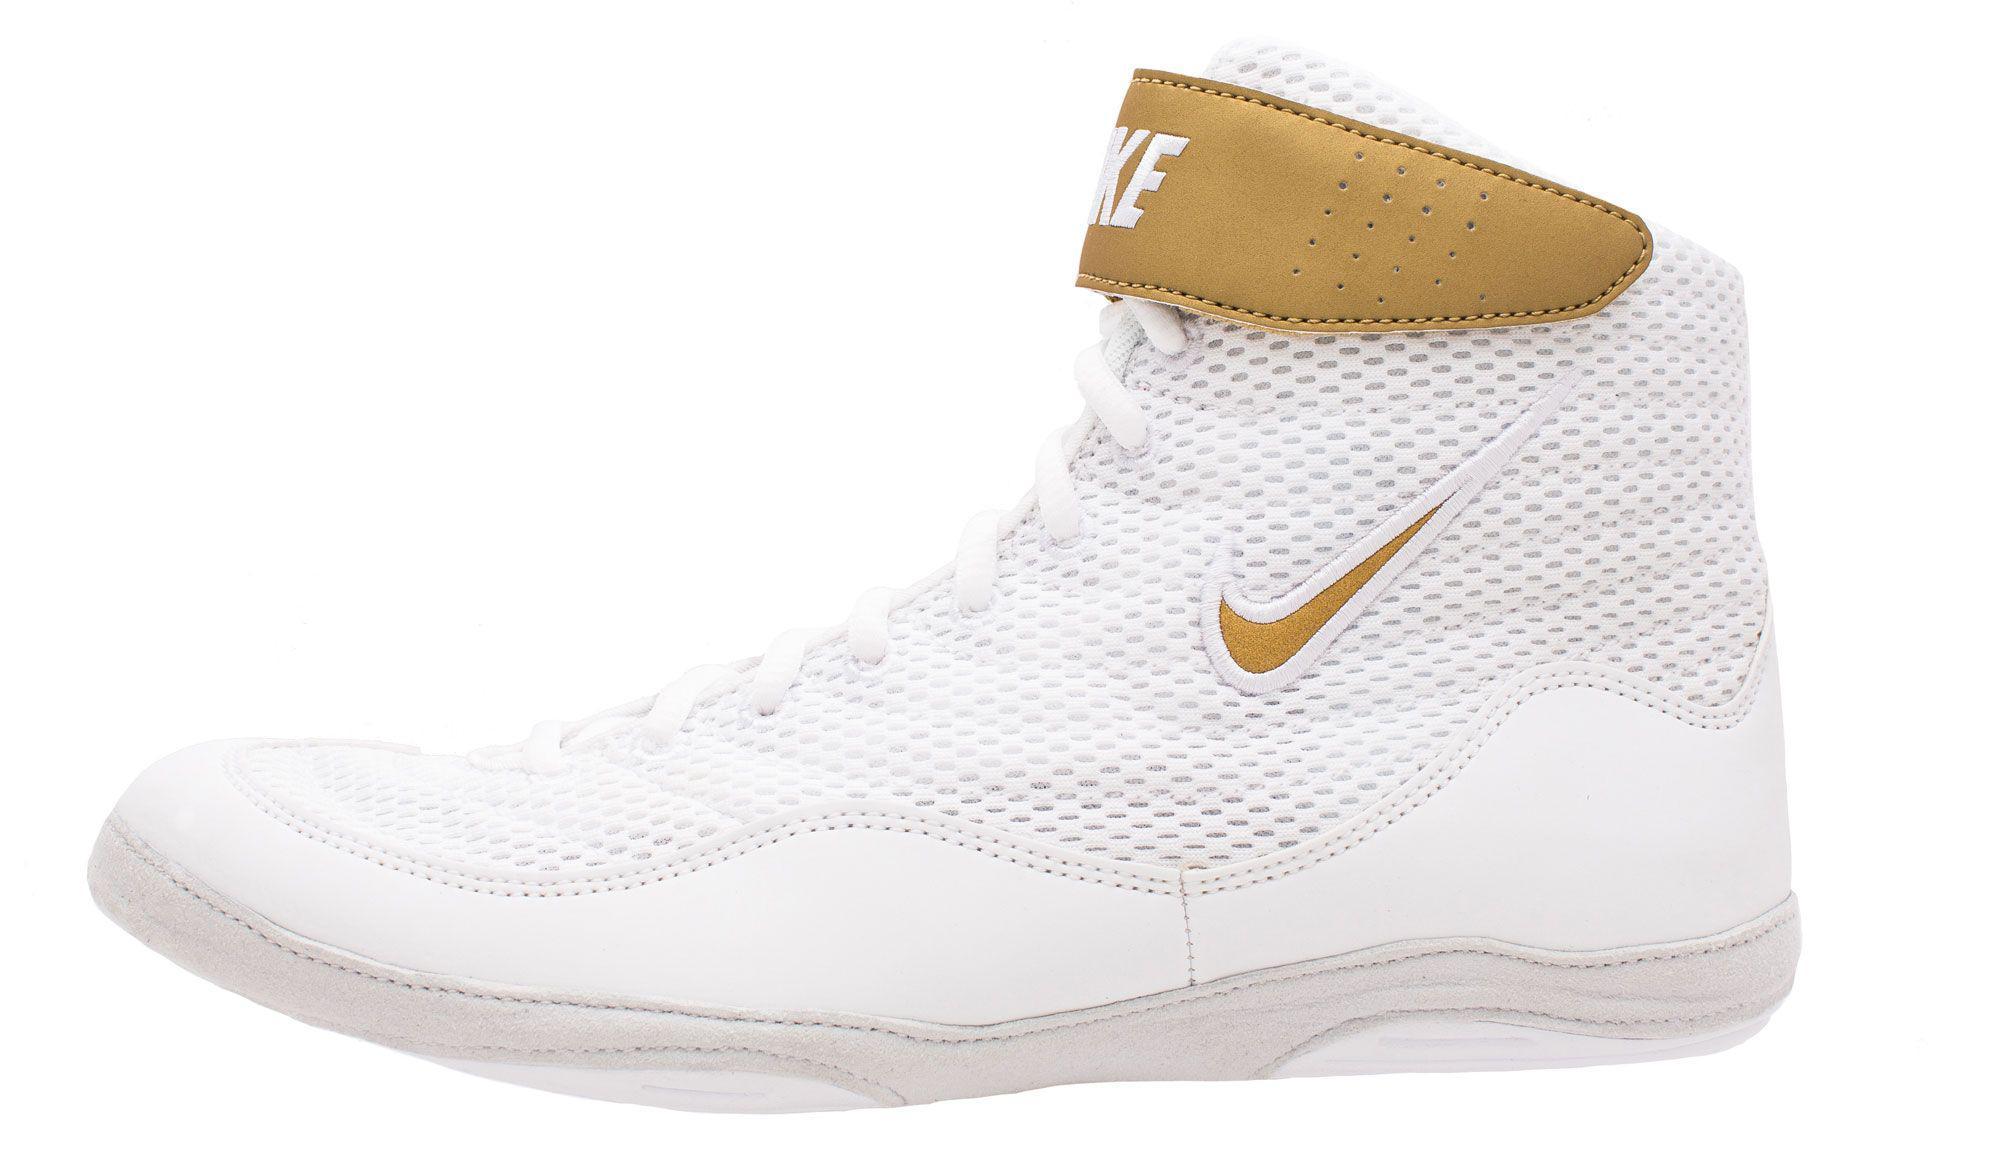 5c00ab7c3de Lyst - Nike Inflict 3 Wrestling Shoes in White for Men